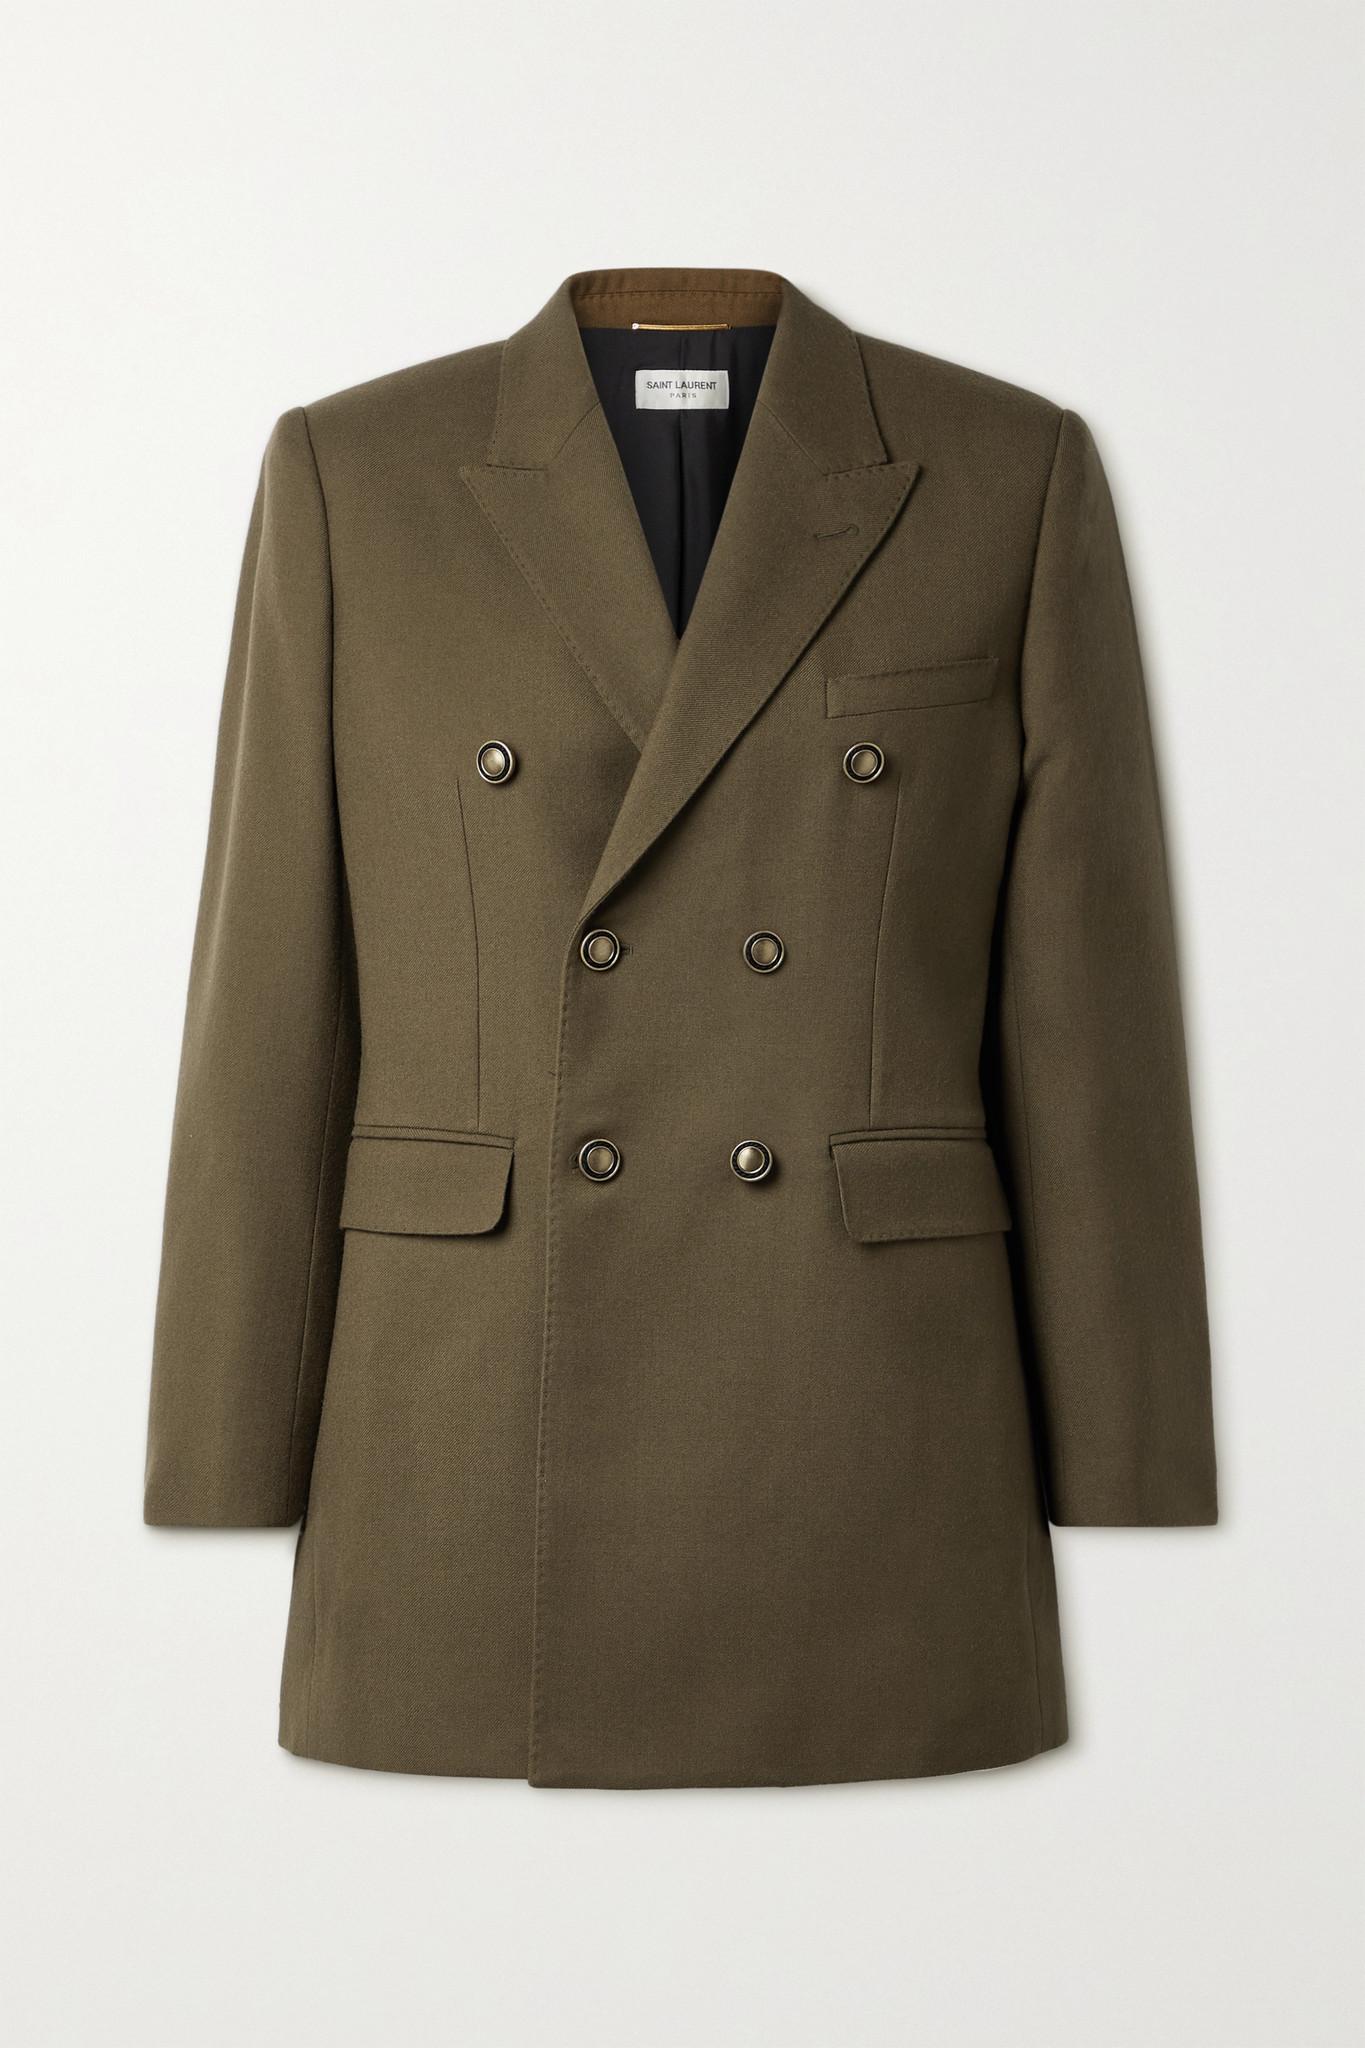 SAINT LAURENT - Double-breasted Wool Blazer - Green - FR34